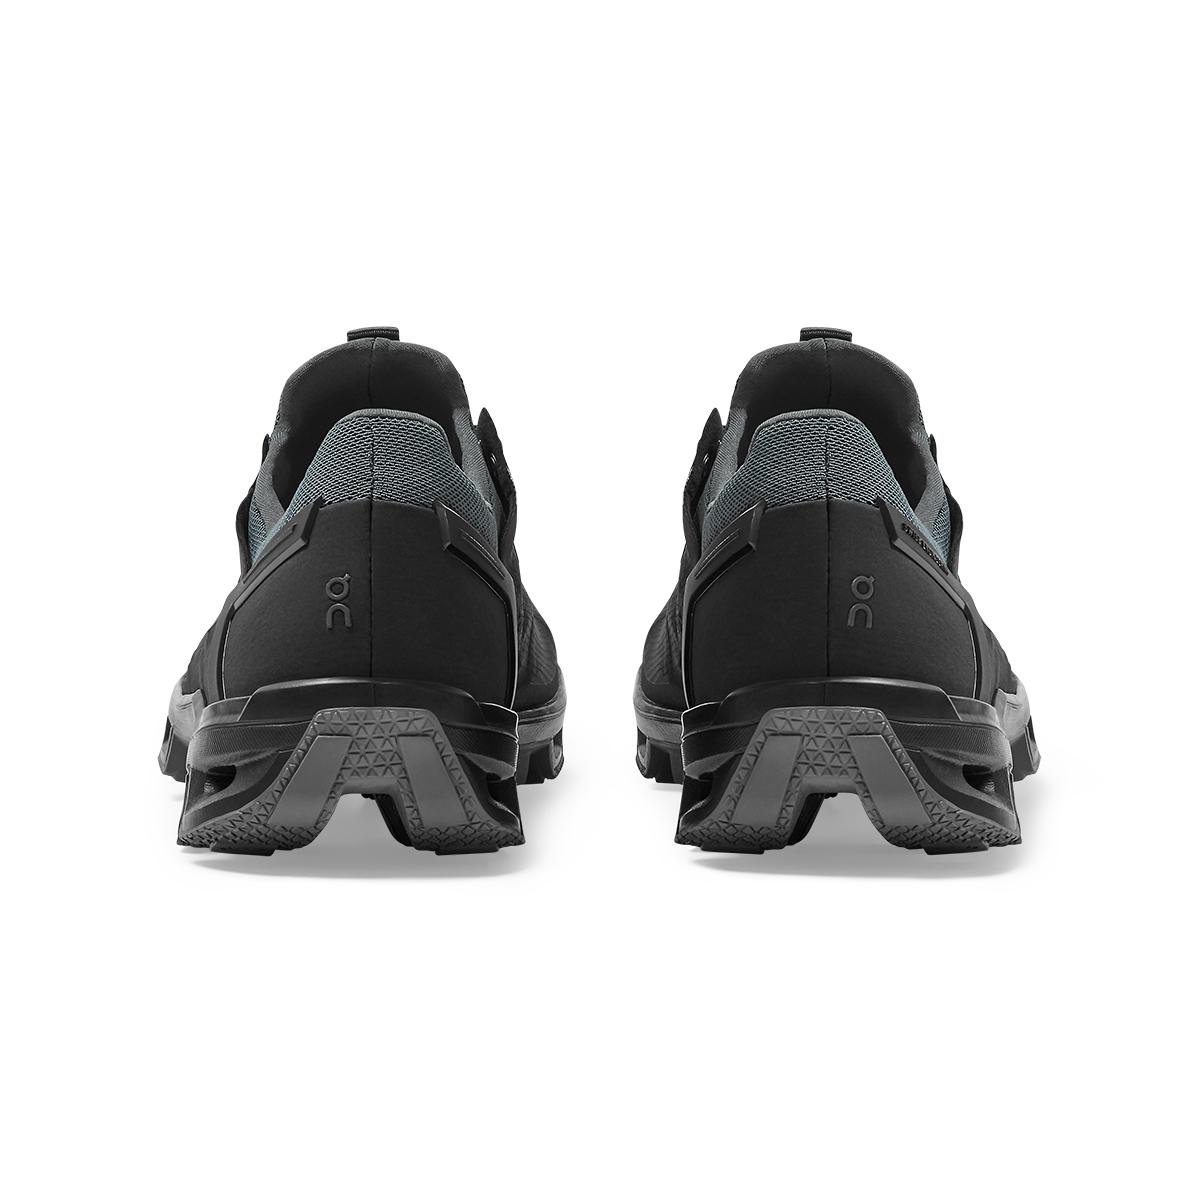 Women's On Cloudventure Peak Running Shoe - Color: Black/Rock - Size: 5 - Width: Regular, Black/Rock, large, image 4